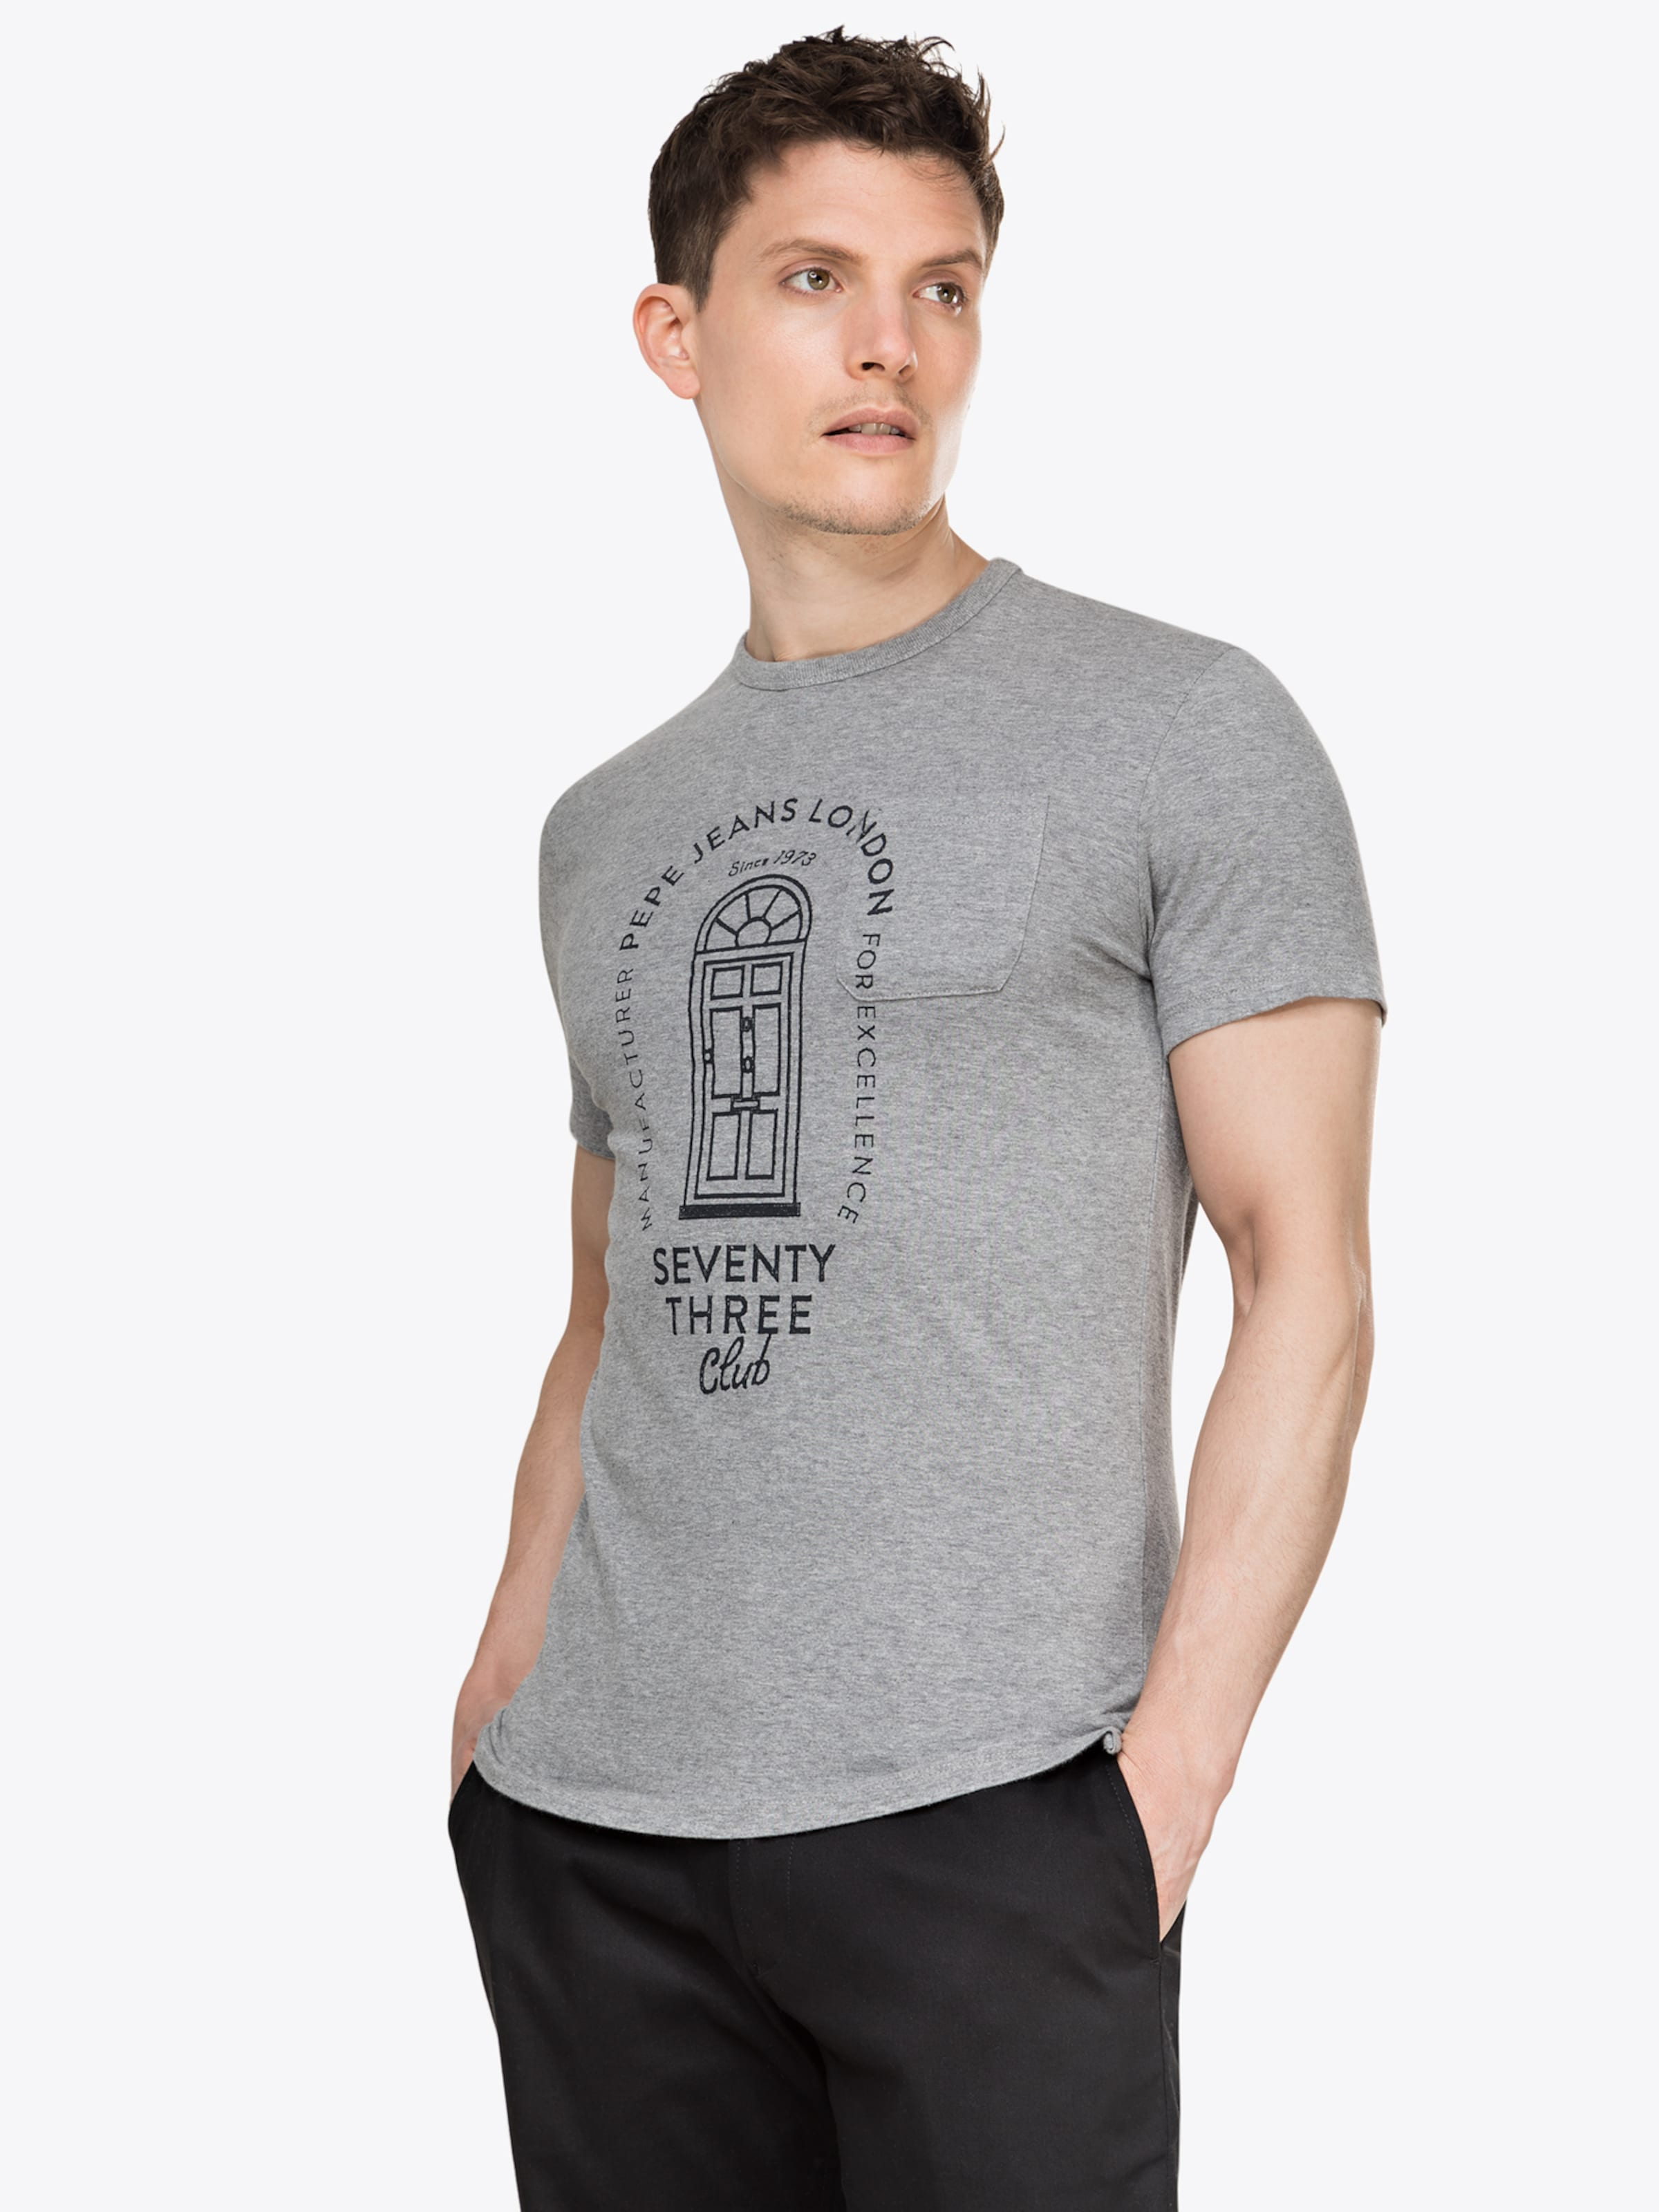 Pepe 'willy' shirt T En Jeans Gris rdtsQhC